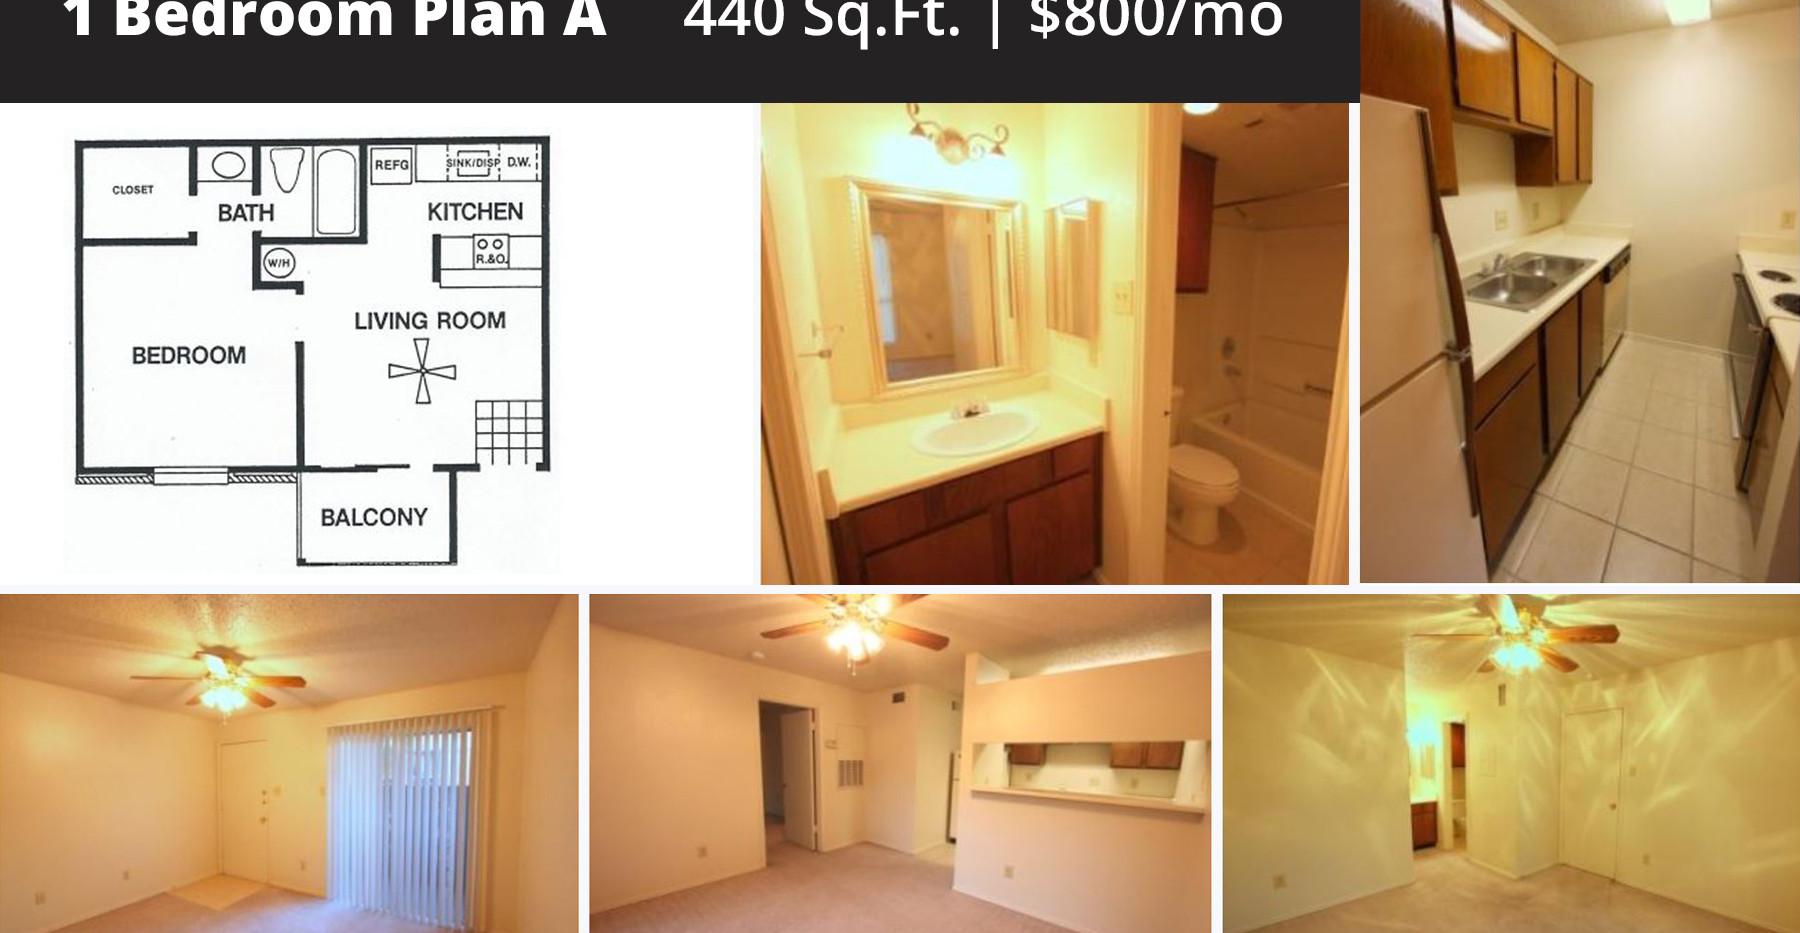 1 bedroom floor layout plan a.jpg